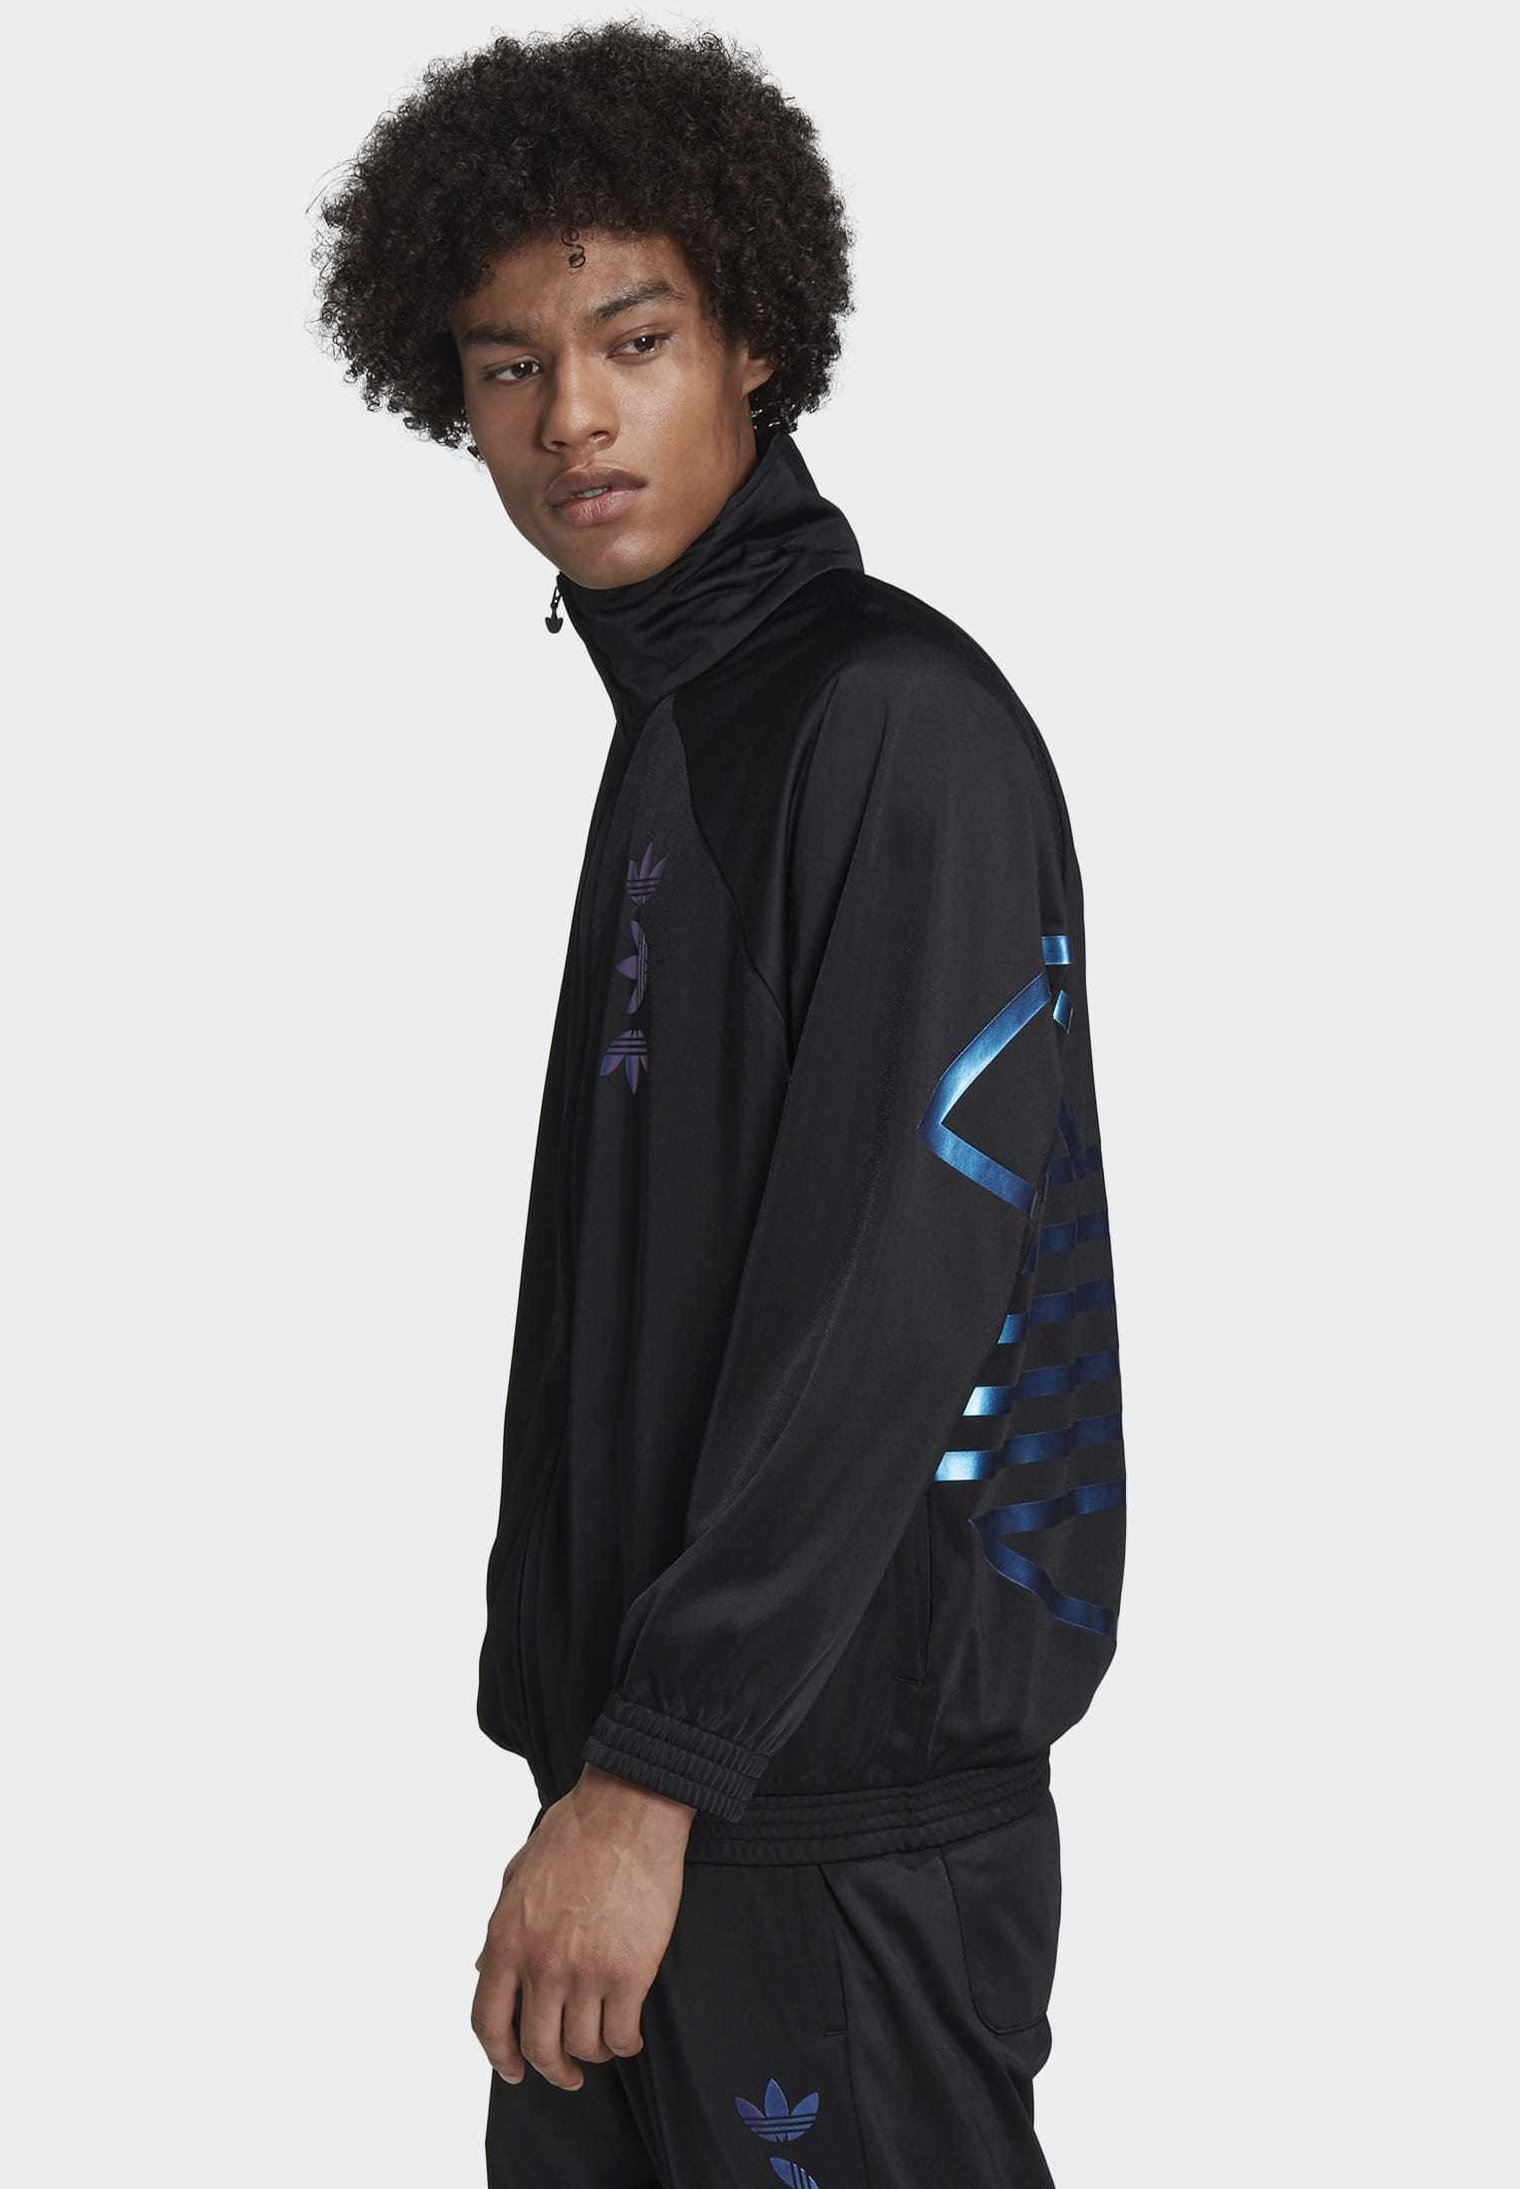 Adidas Originals Zeno Track Top - Kurtka Sportowa Black